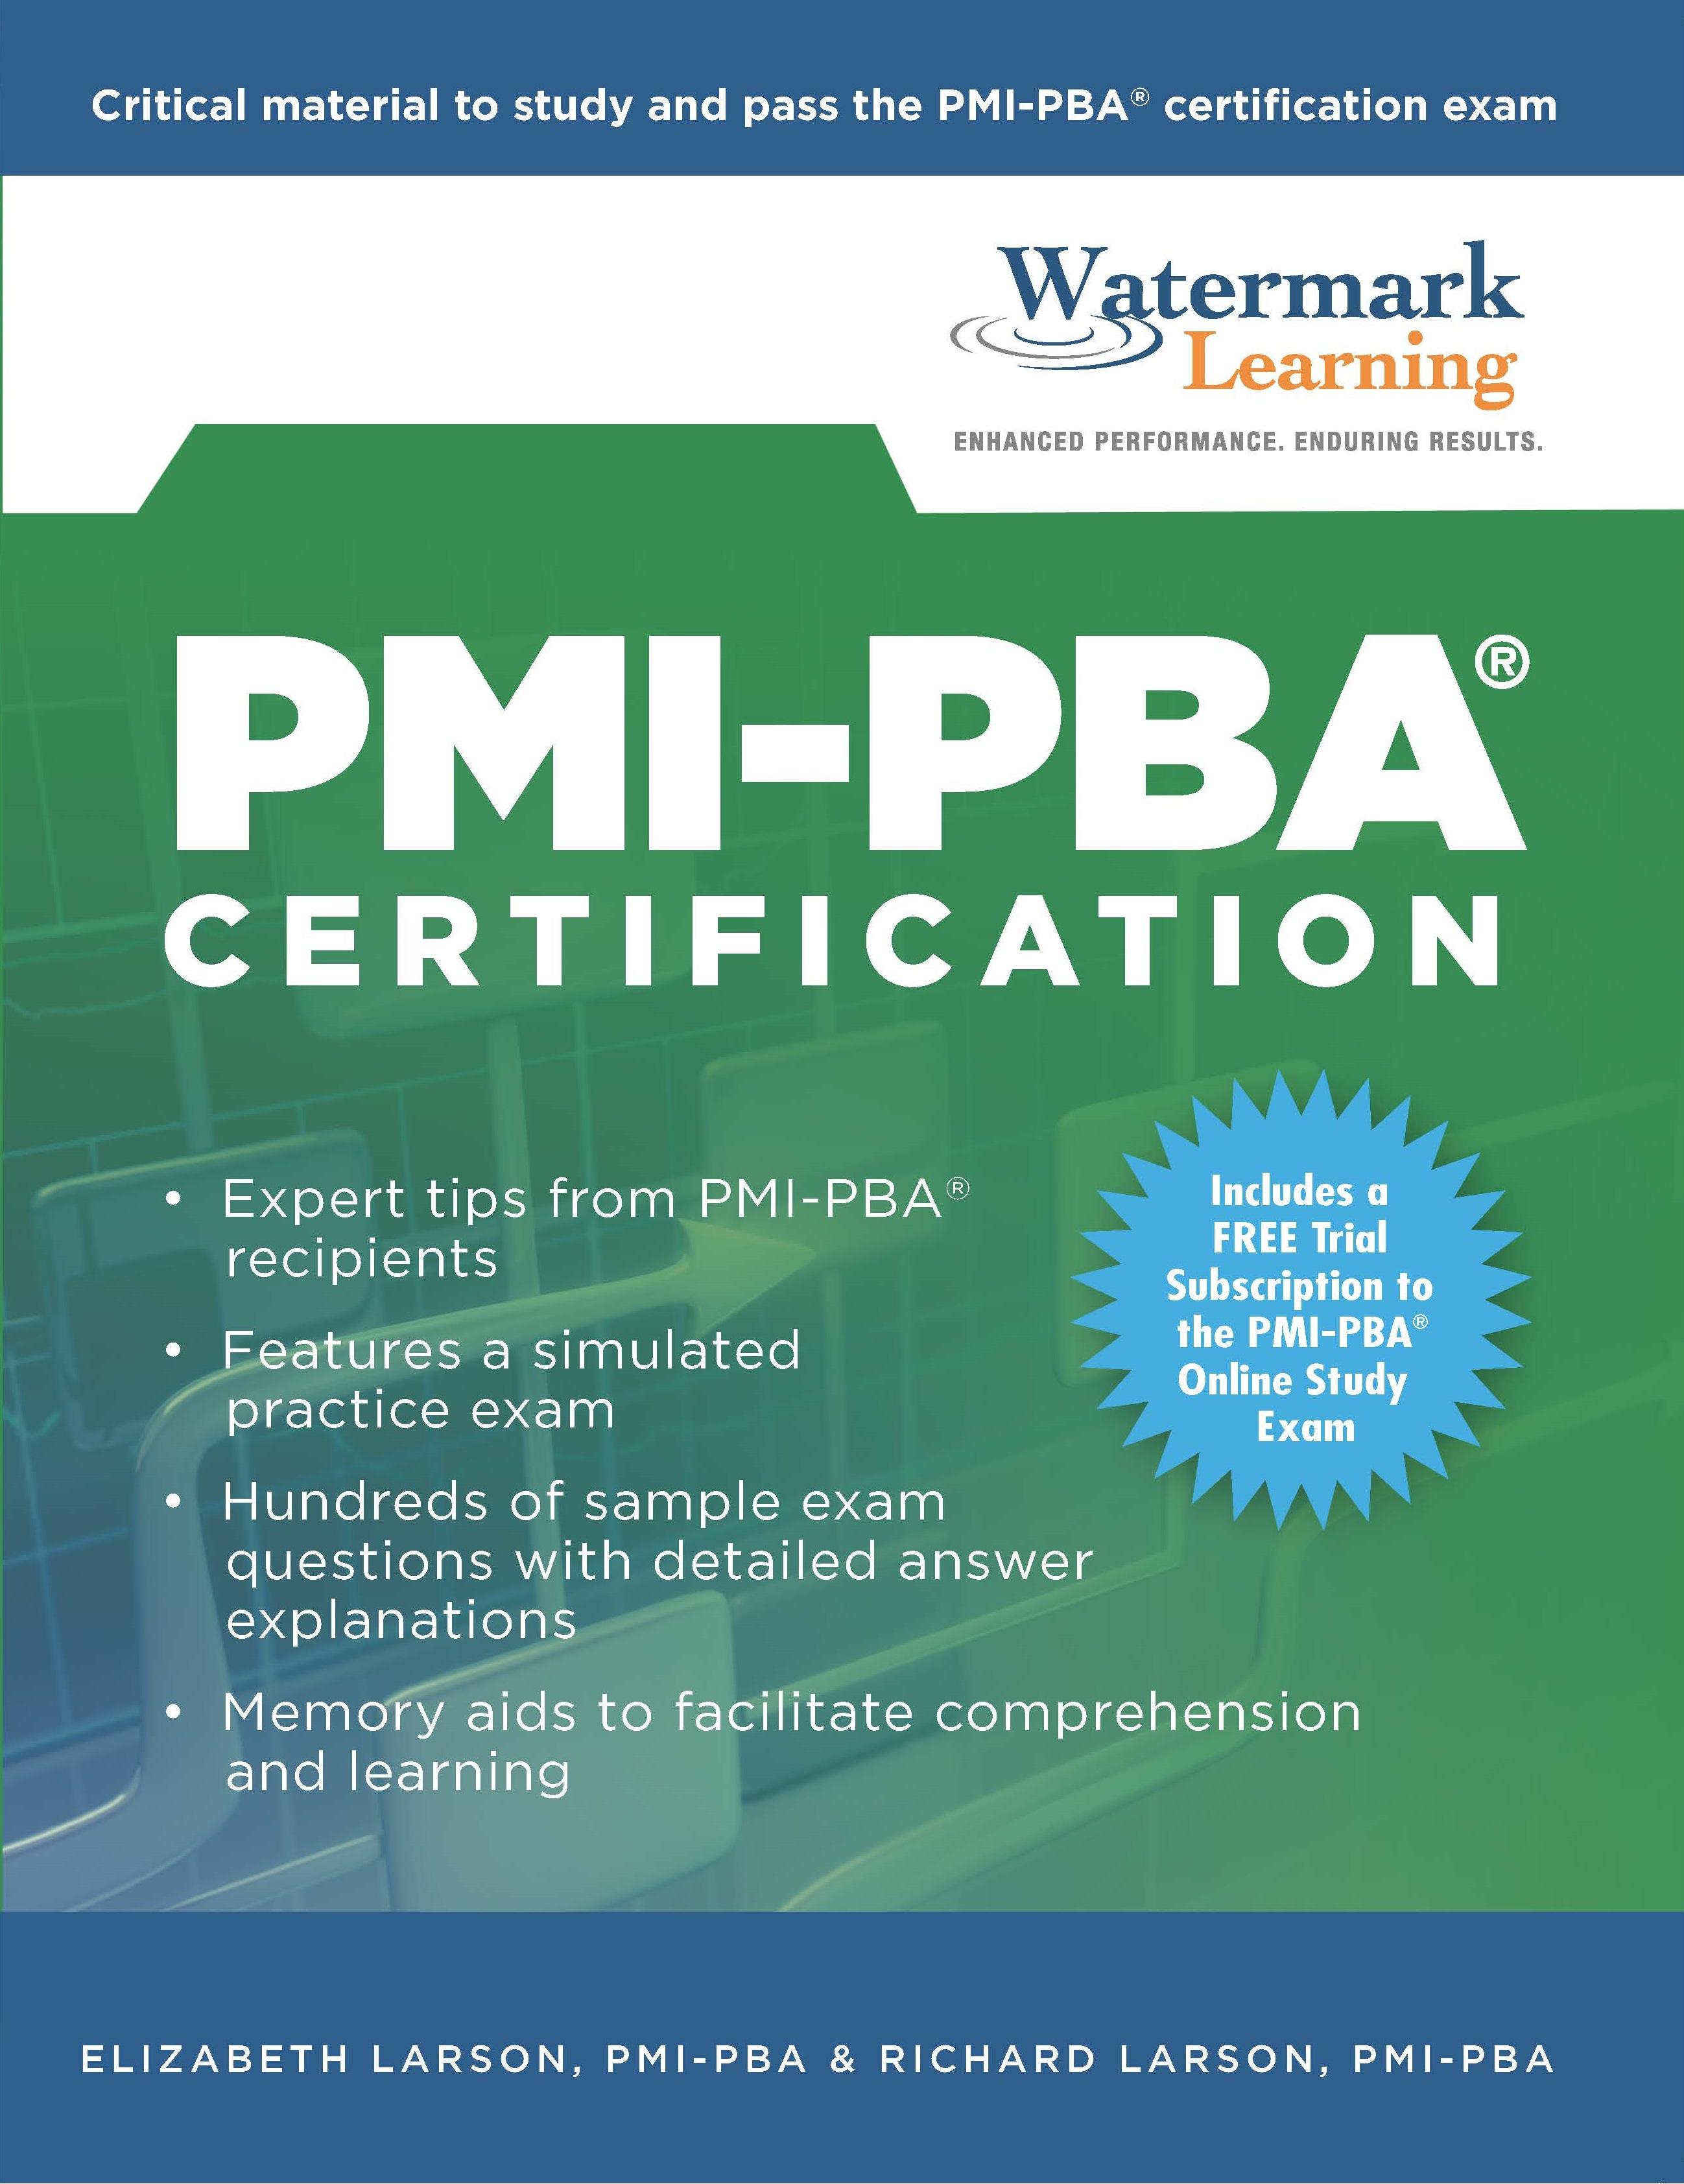 PMI-PBA Exam Guidance